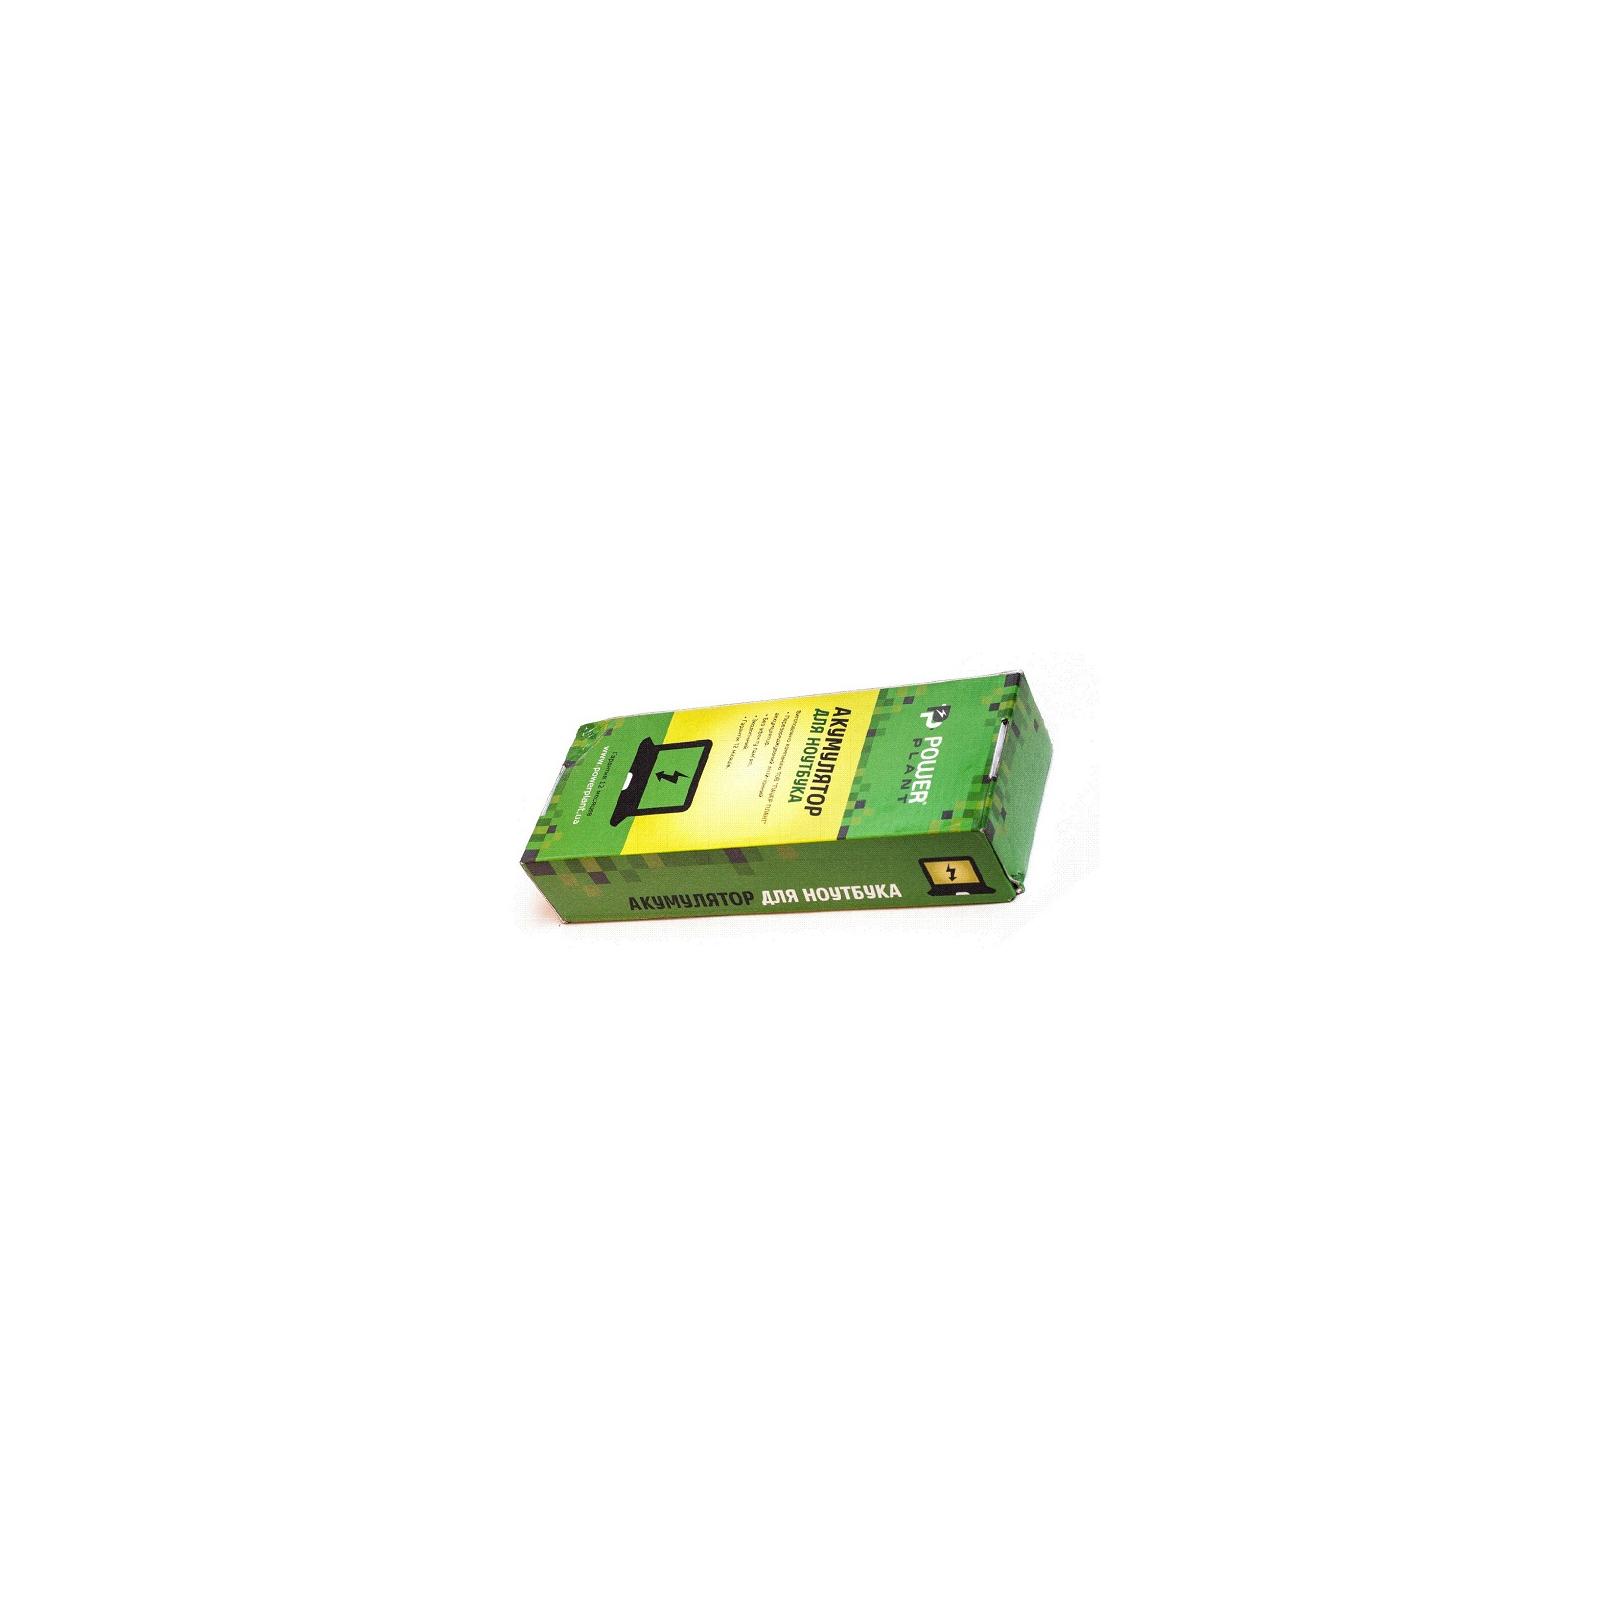 Аккумулятор для ноутбука ASUS X51H (A32-T12, AS5151LH) 11.1V 5200mAh PowerPlant (NB00000011) изображение 3